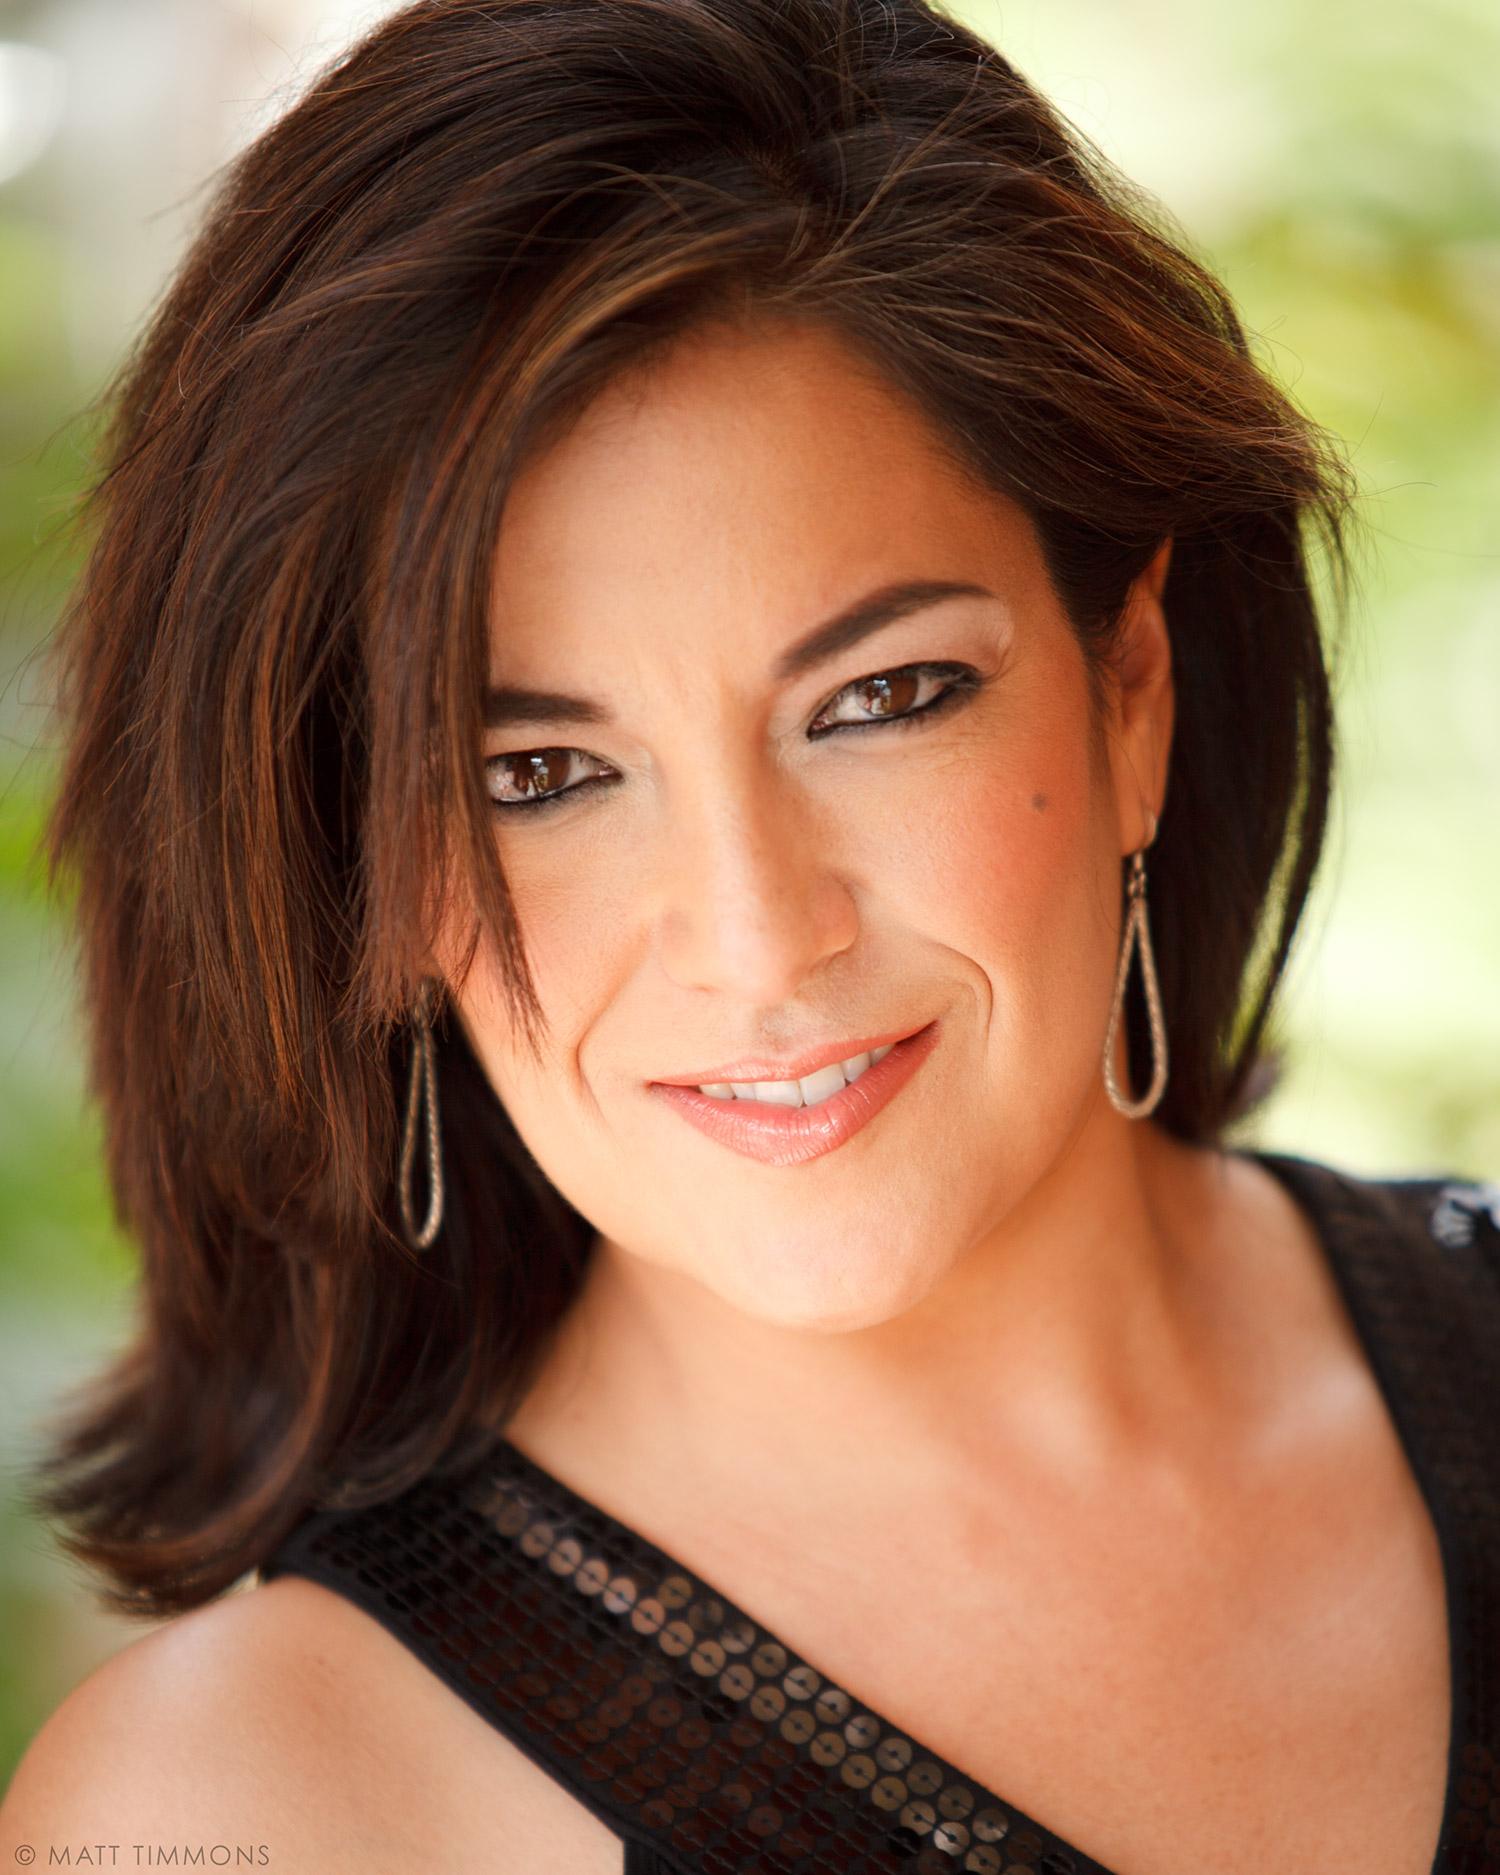 Professional Albuquerque Head Shots: Irene Estrada, Television Show Host.